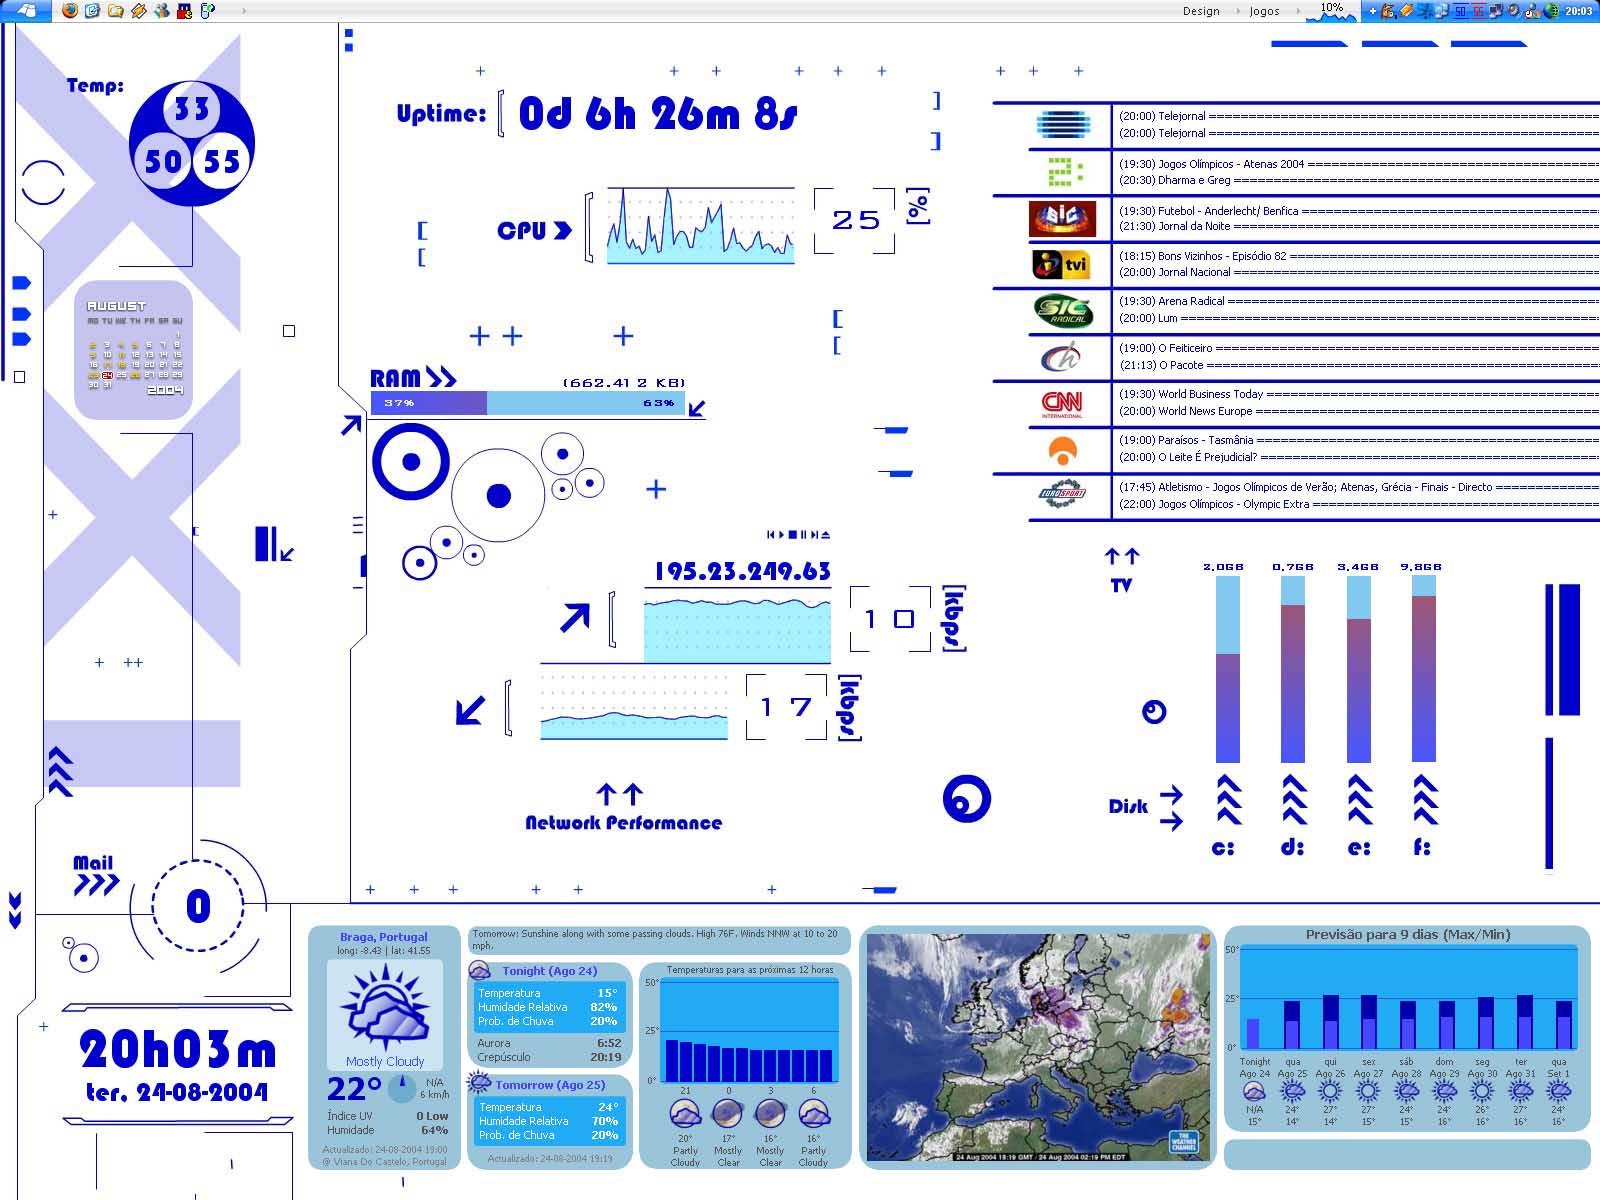 Title: DesktopXXI - blue